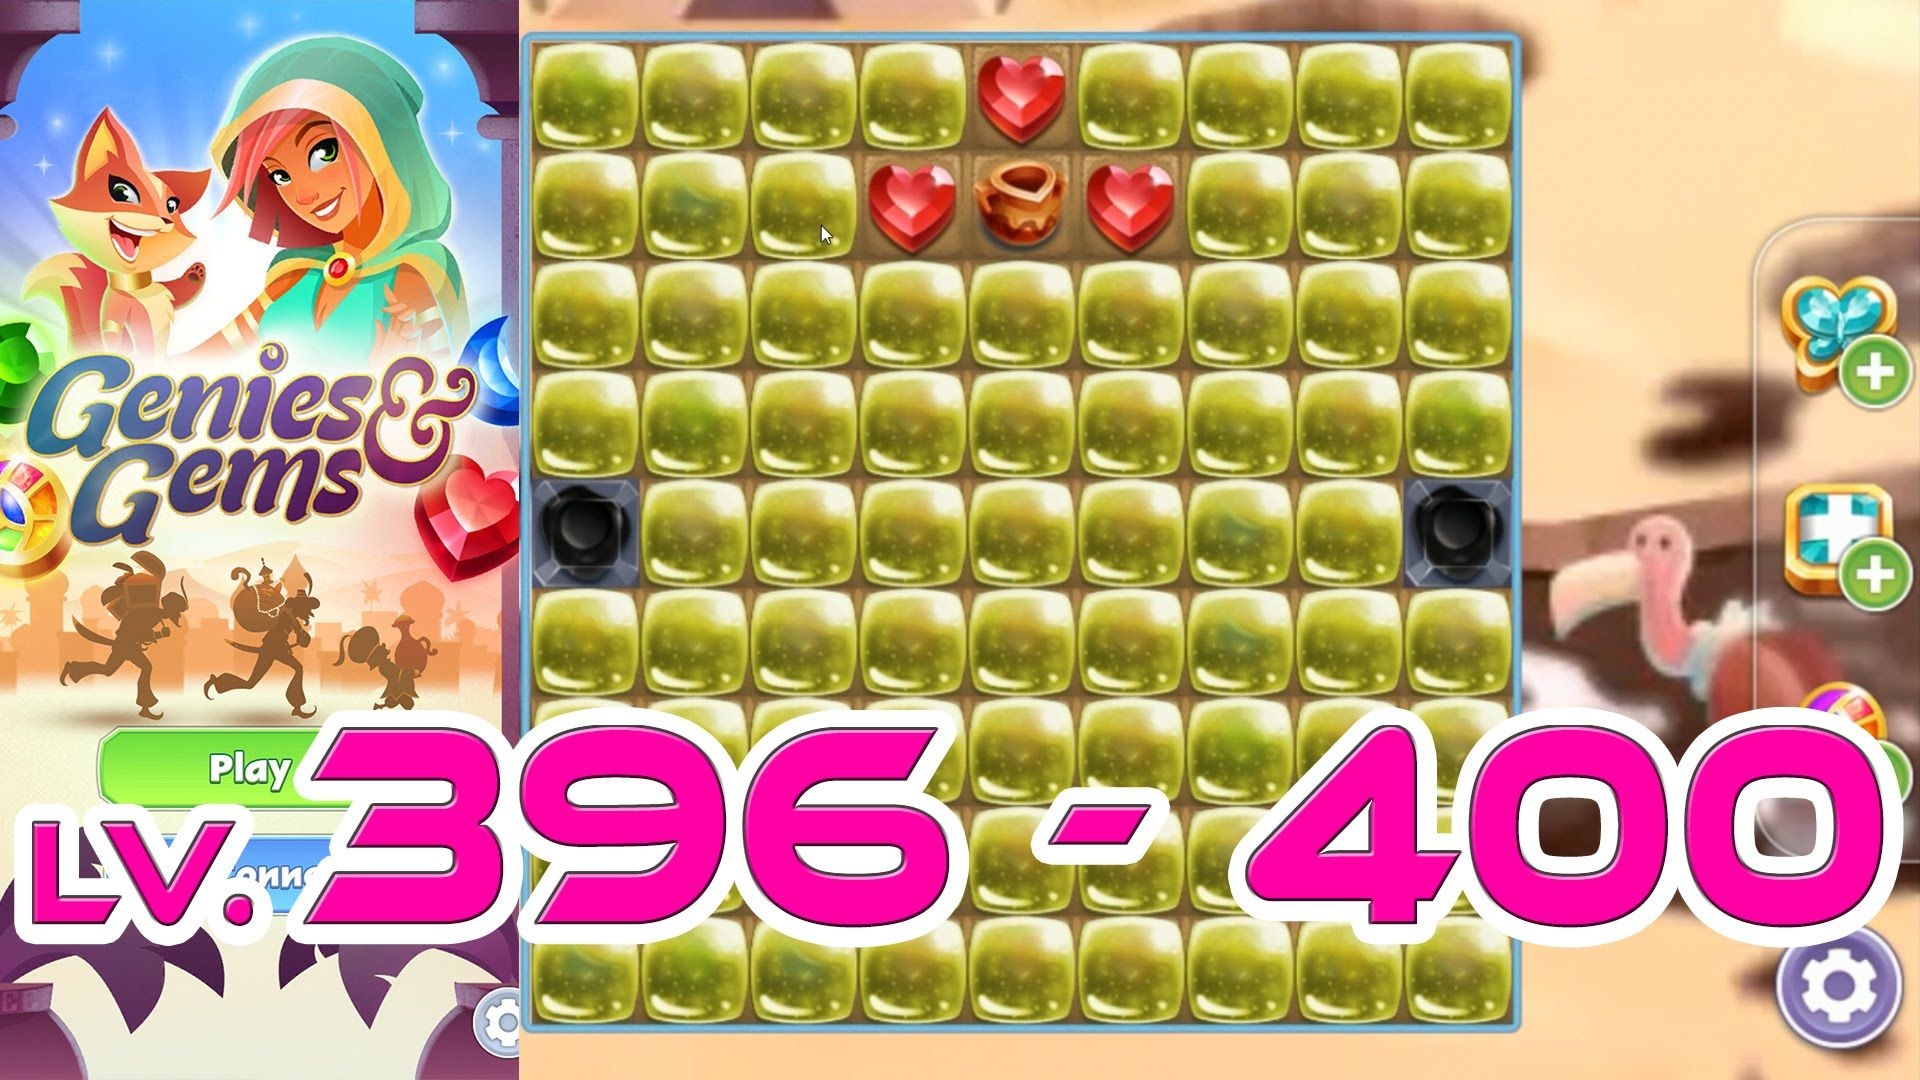 Genies & Gems - Level 396 - 400 (1080p/60fps) | Genies & Gems